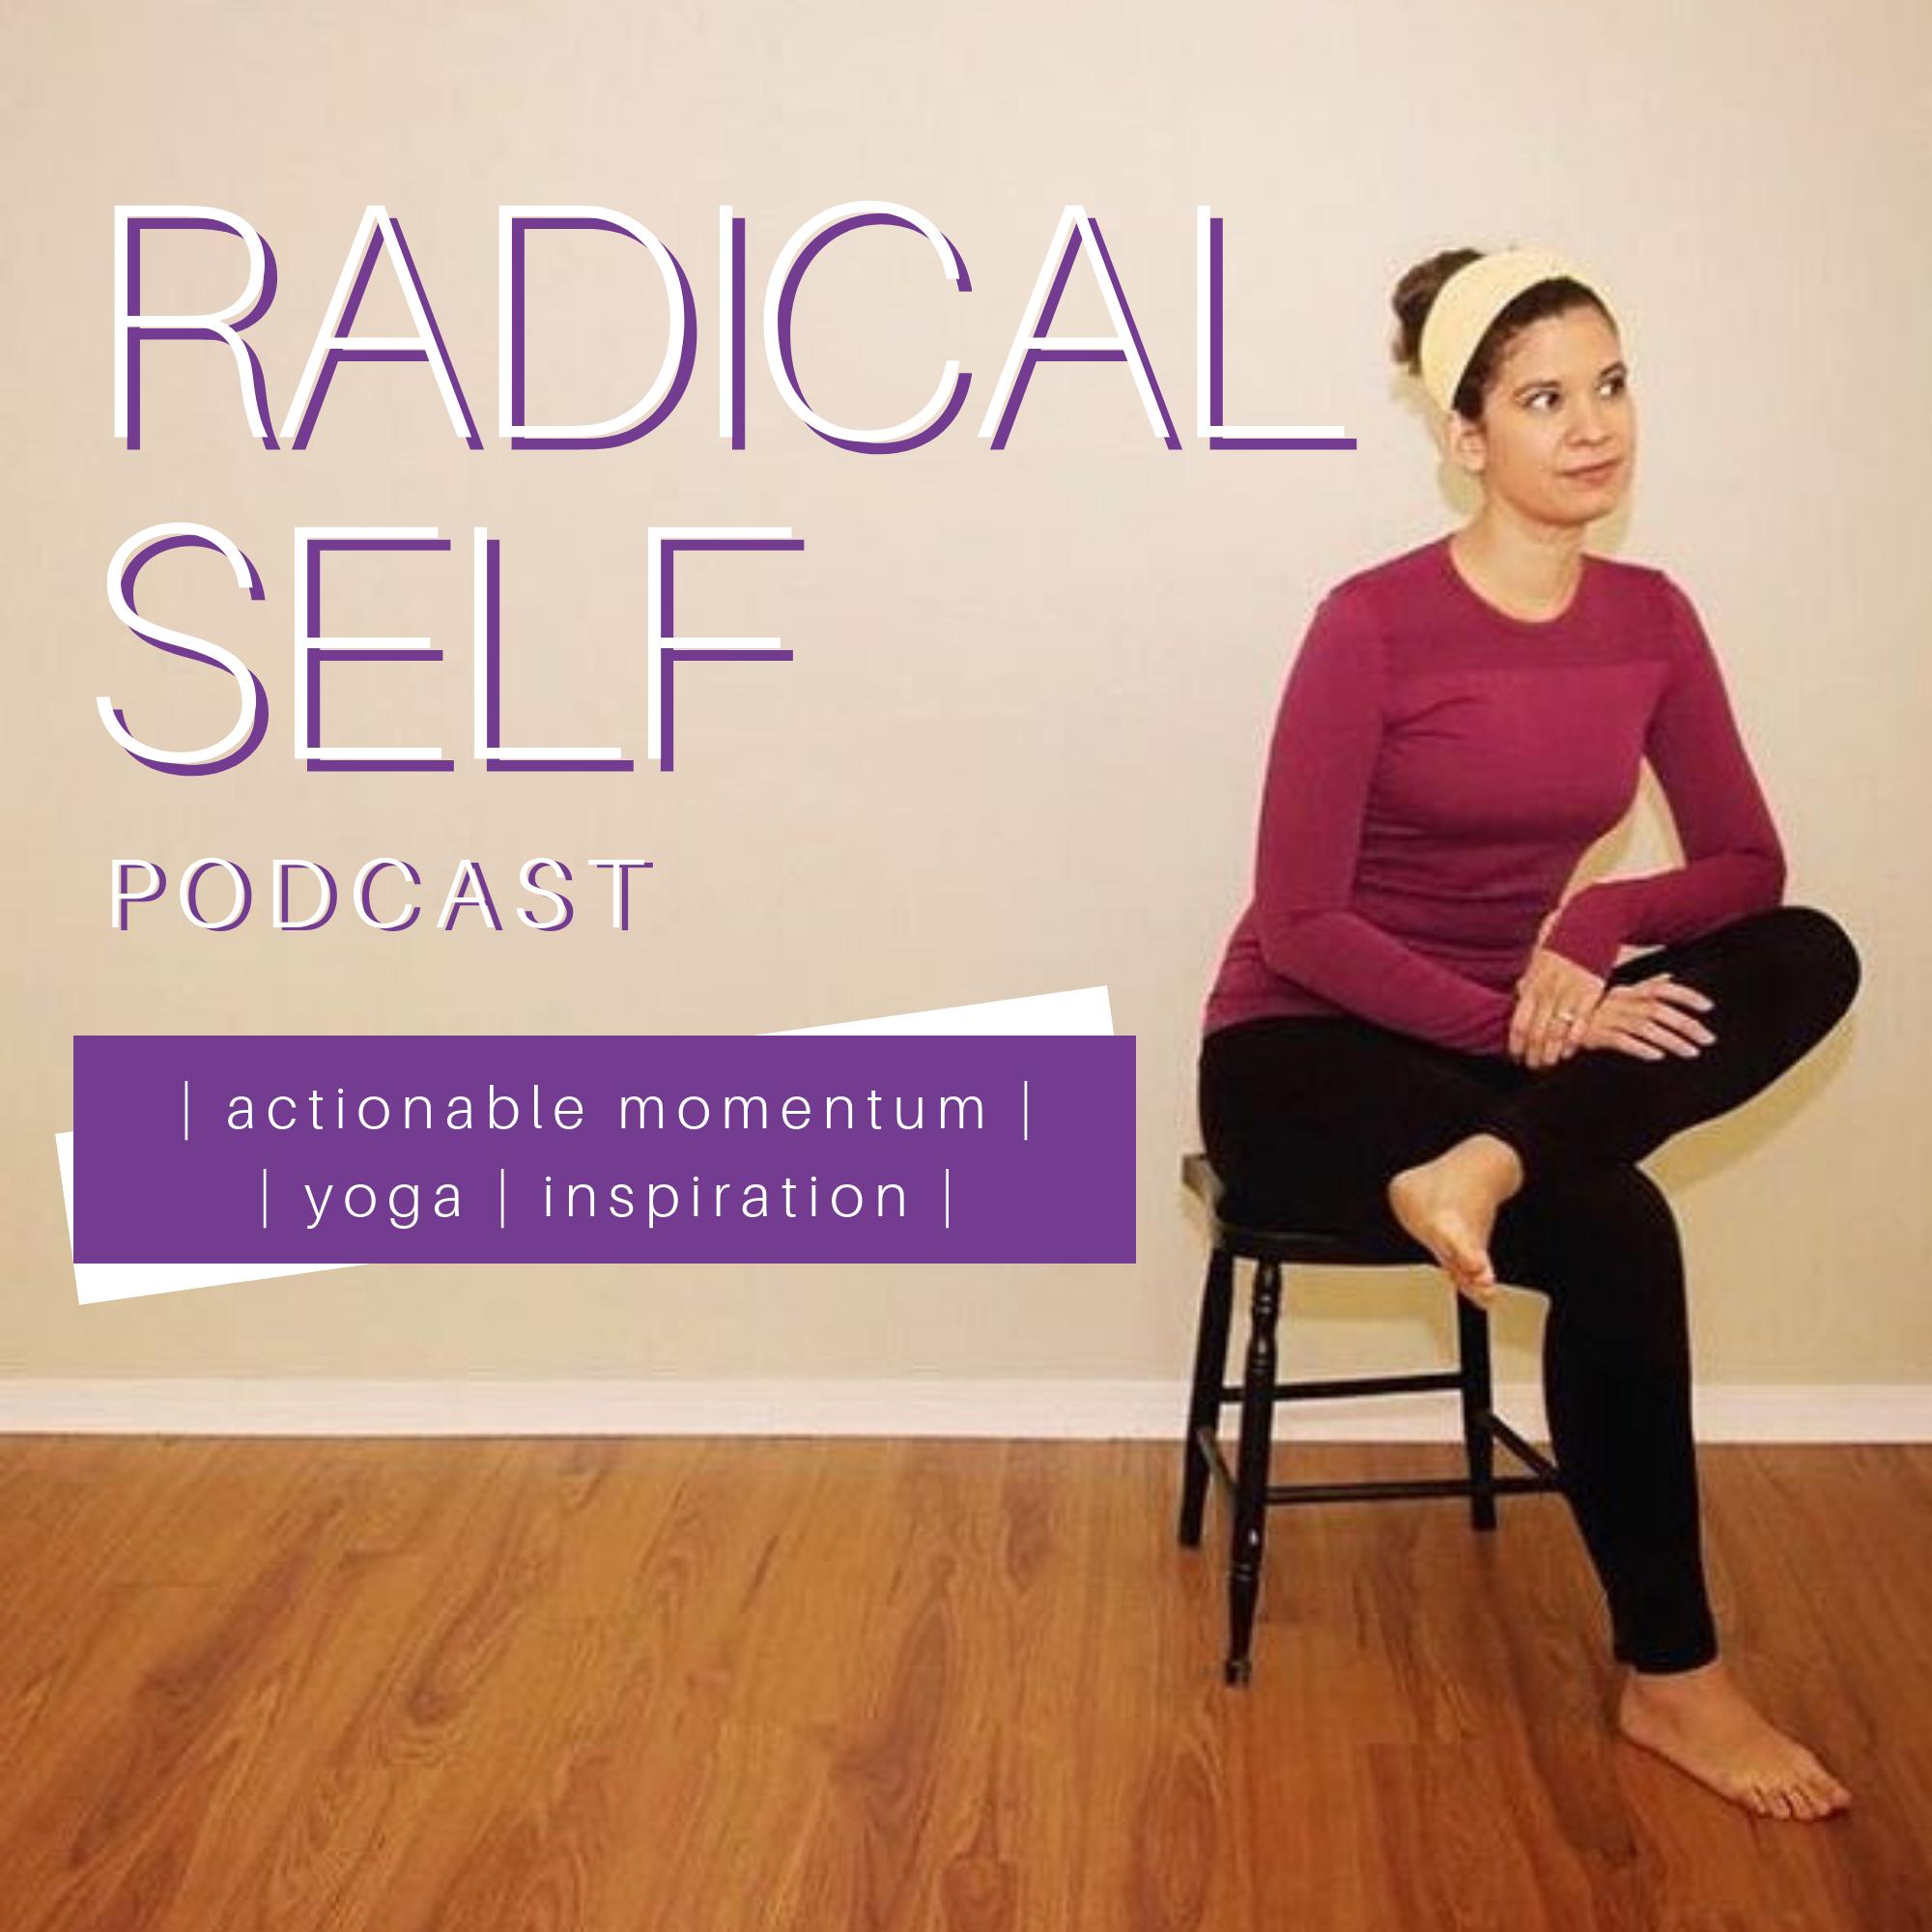 Radical Self Podcast show art